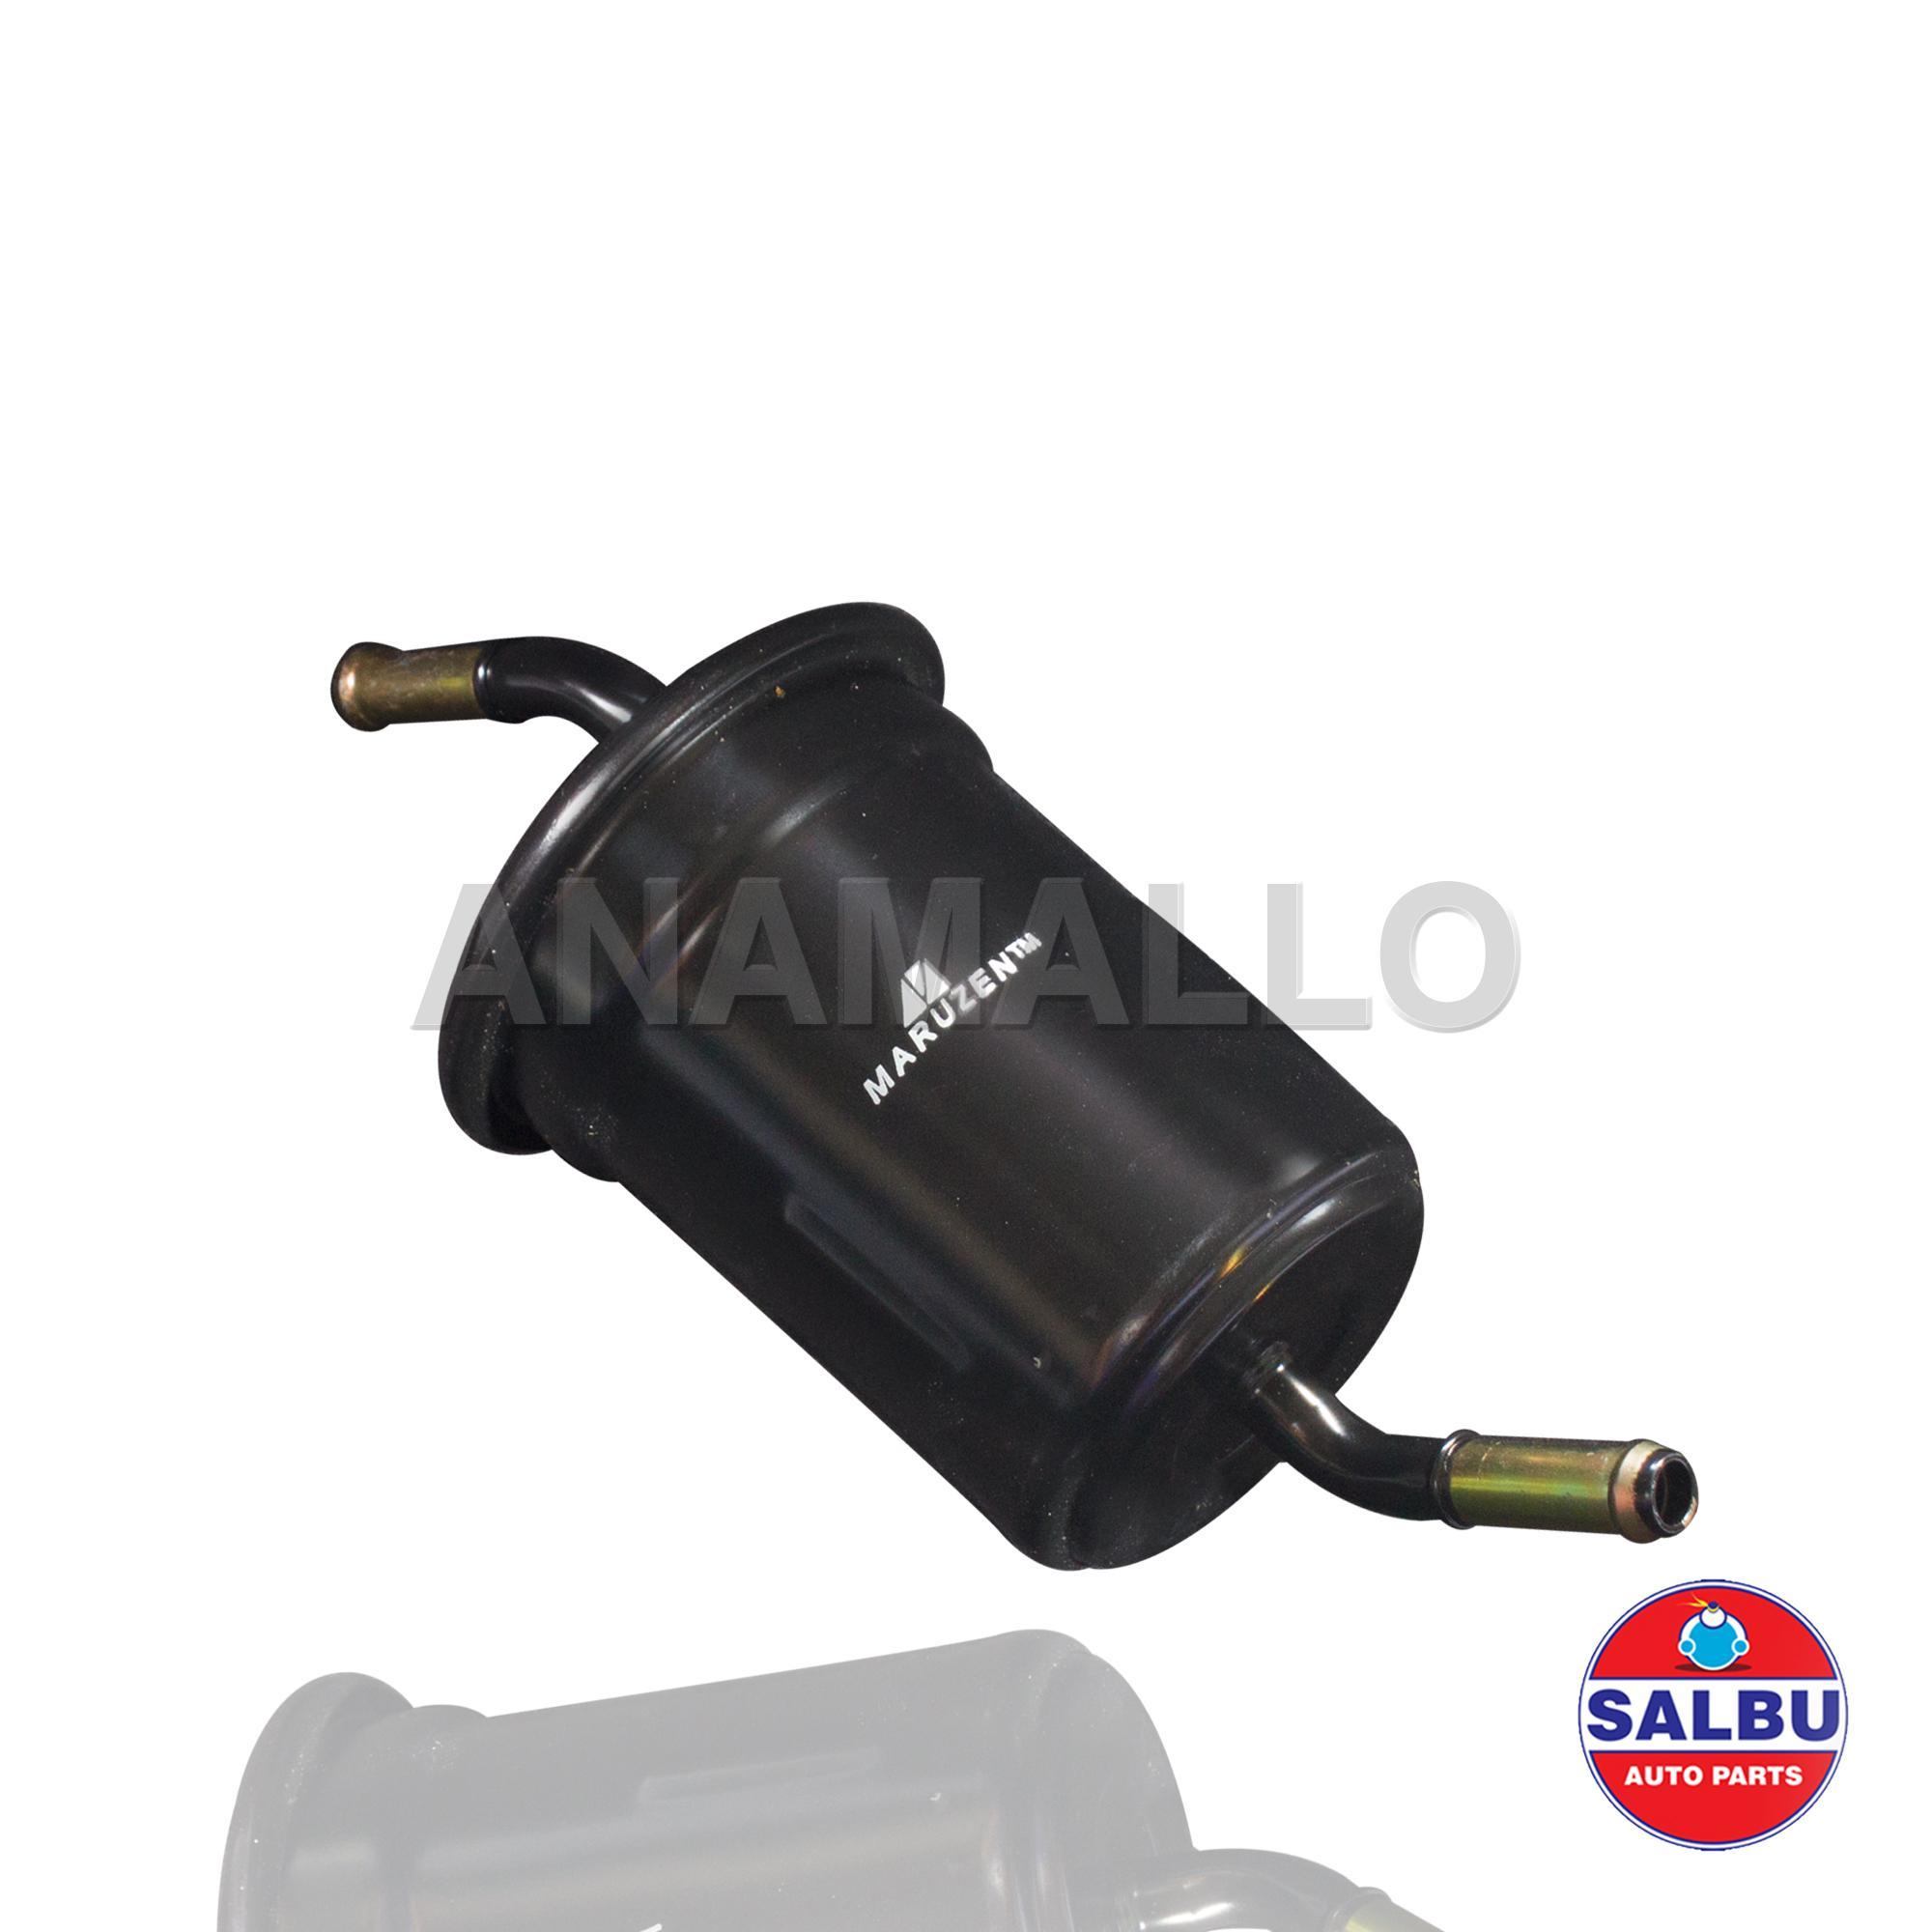 hight resolution of maruzen fuel filter b6bf 20 490 for mazda familia 323 1990 2000